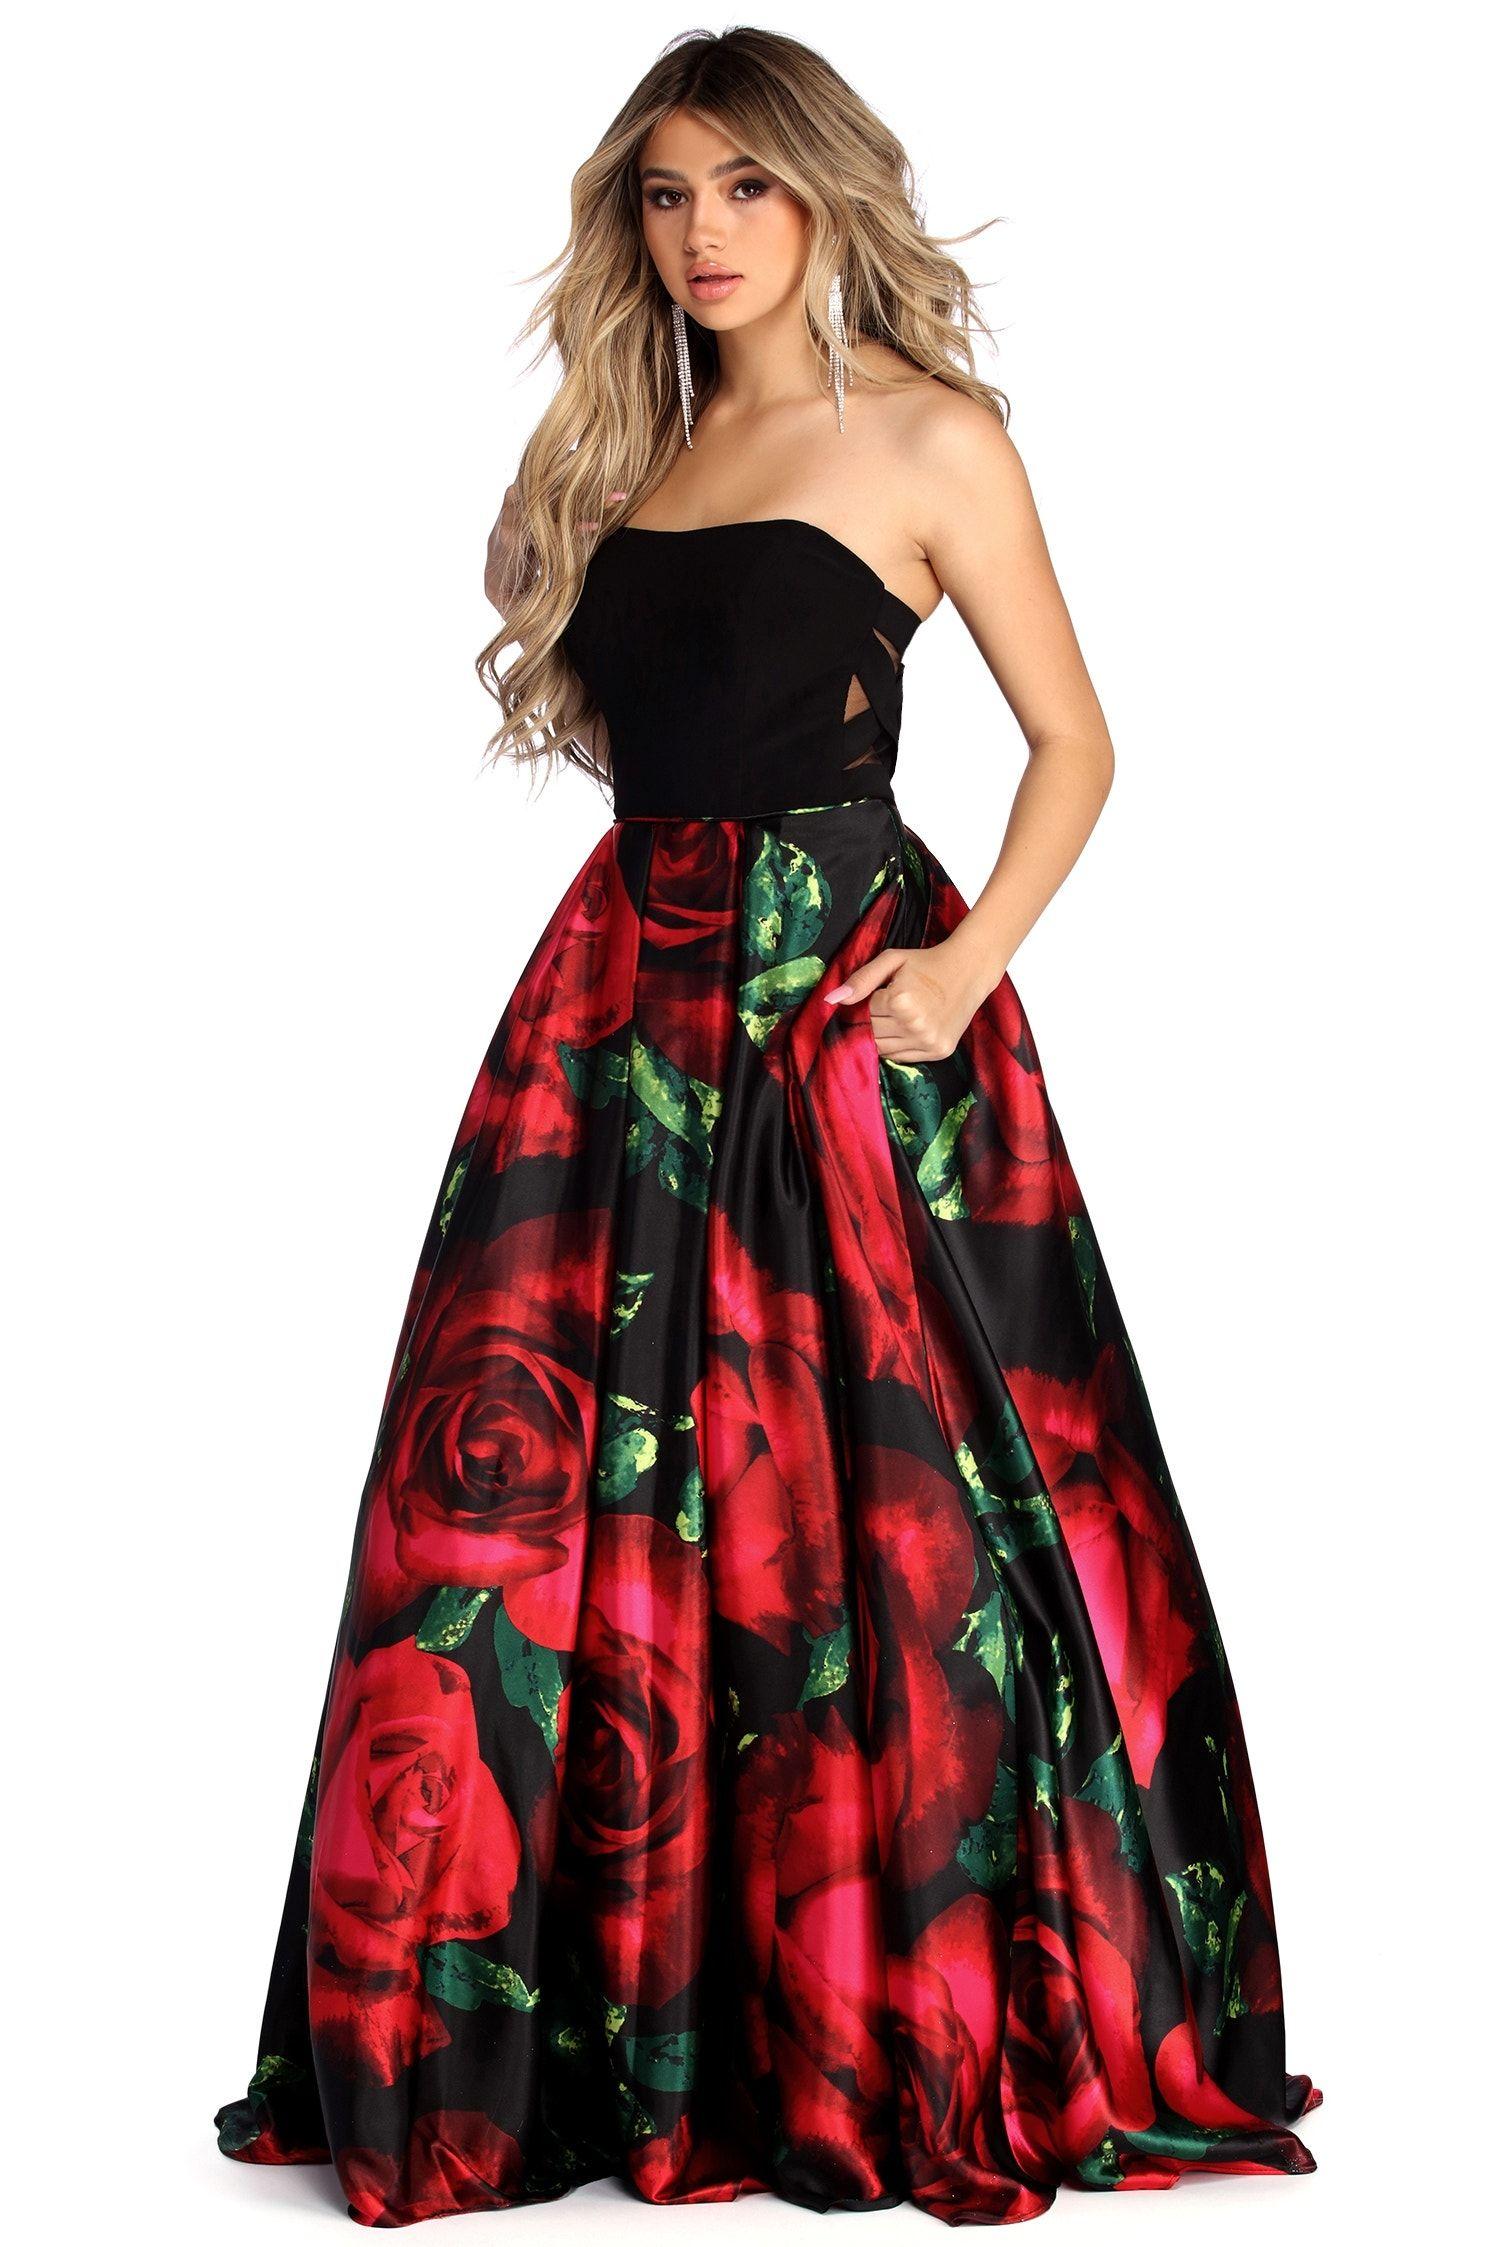 Sariah Black Strapless Rose Ball Gown Dresses Strapless Dress Formal Short Dress Styles [ 2247 x 1500 Pixel ]